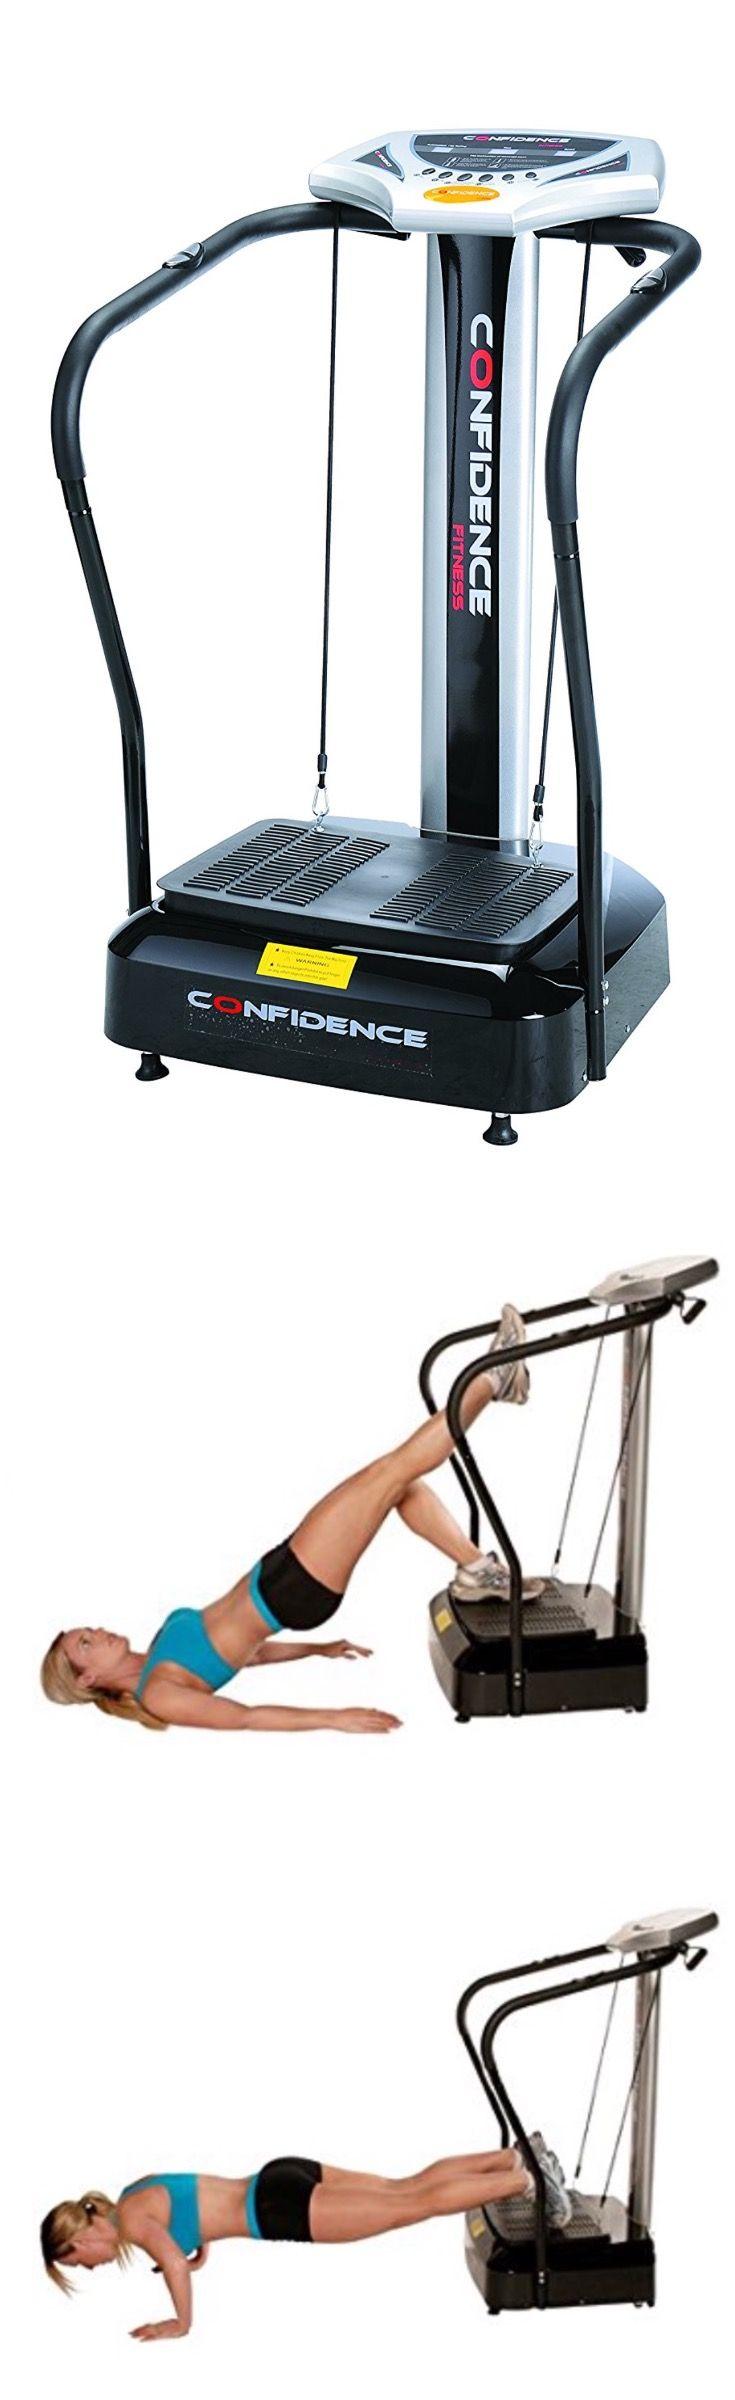 Confidence Full Body Vibration Platform Fitness Machine for Low Impact Exercises  $ 249.99